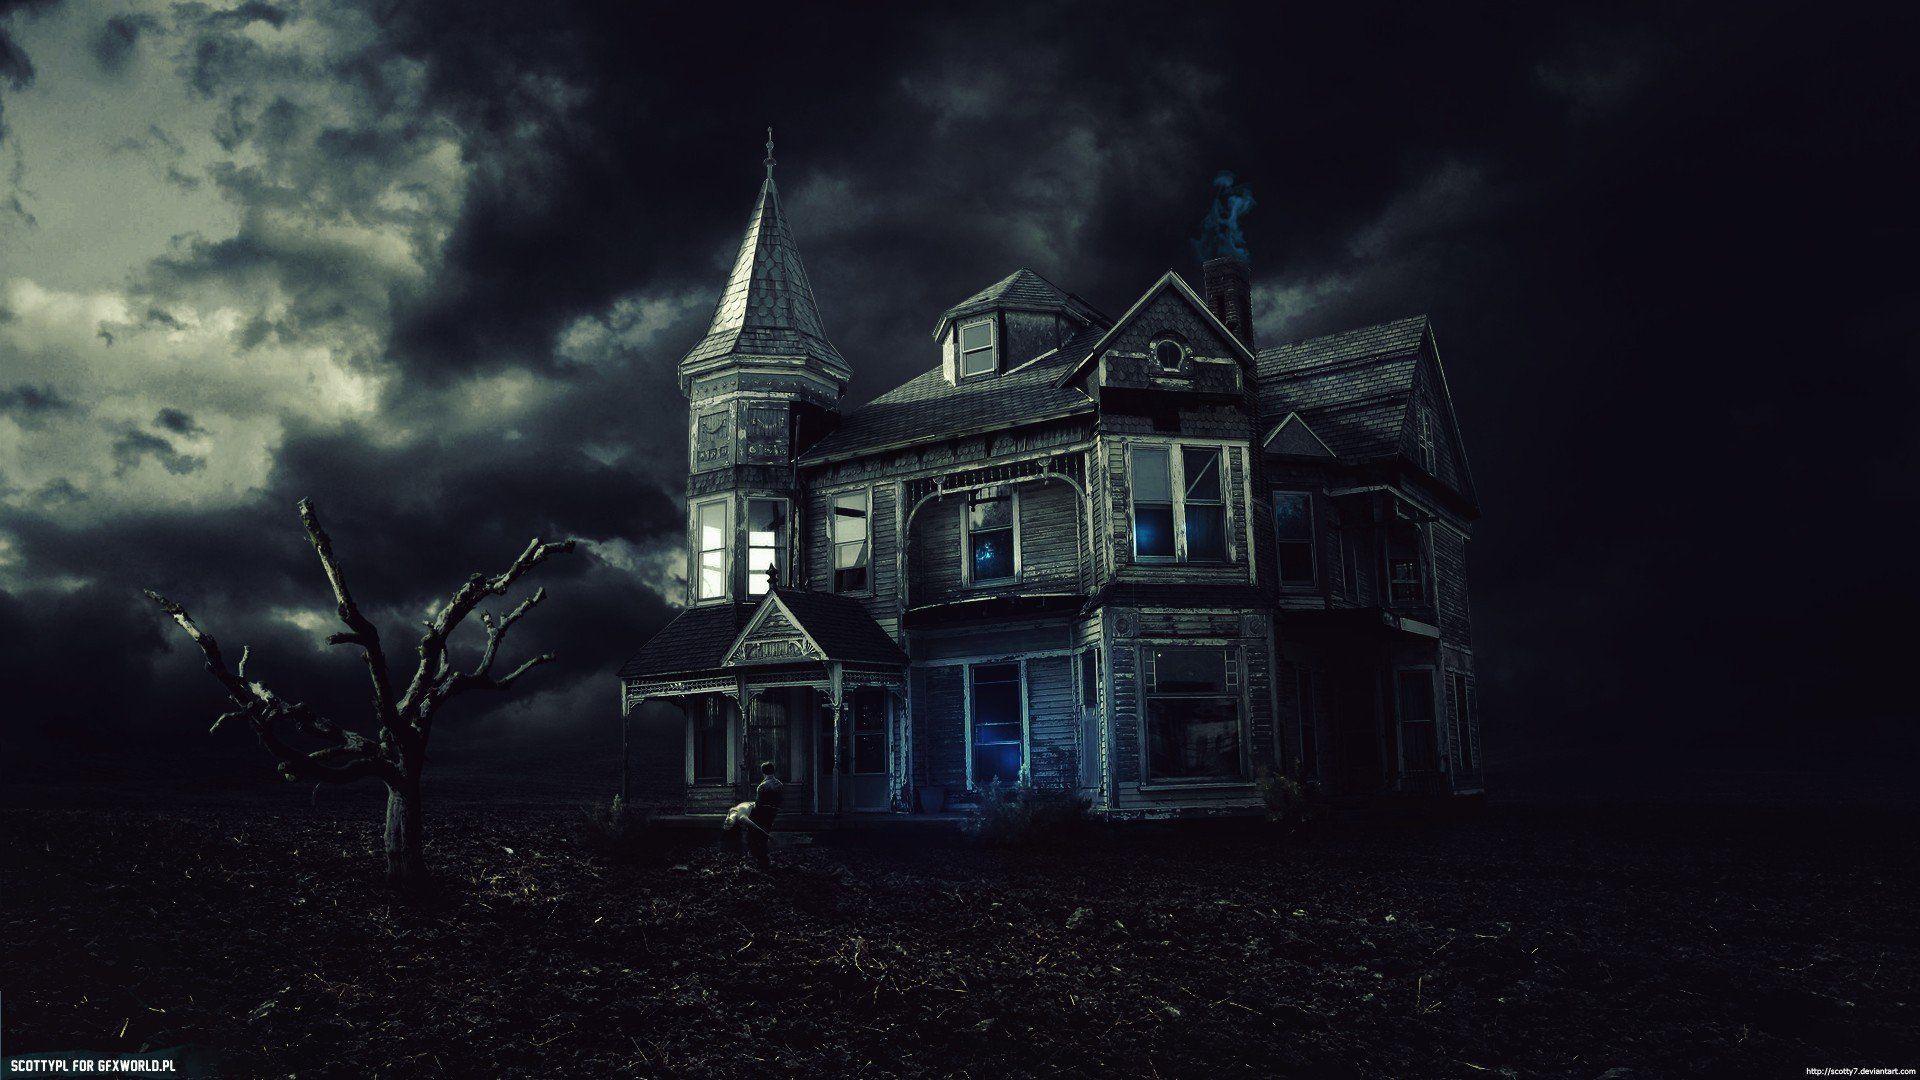 Halloween Creepy House Wallpapers - Wallpaper Cave